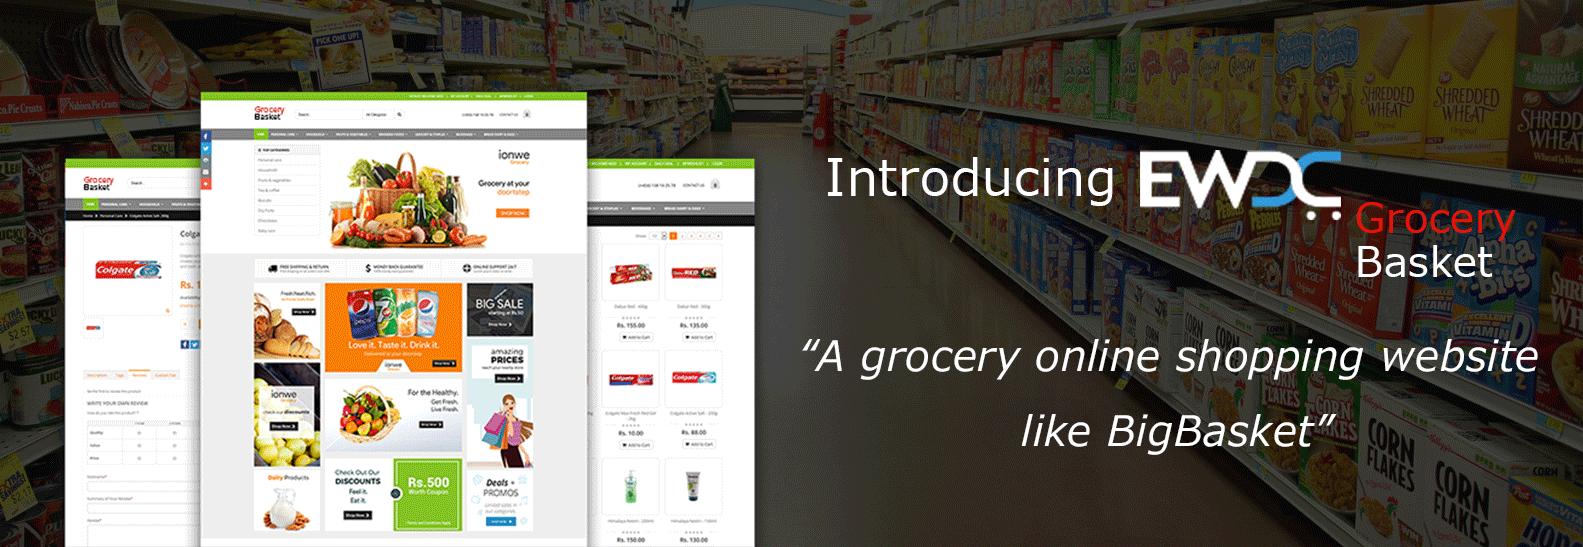 grocery online shopping website like BigBasket